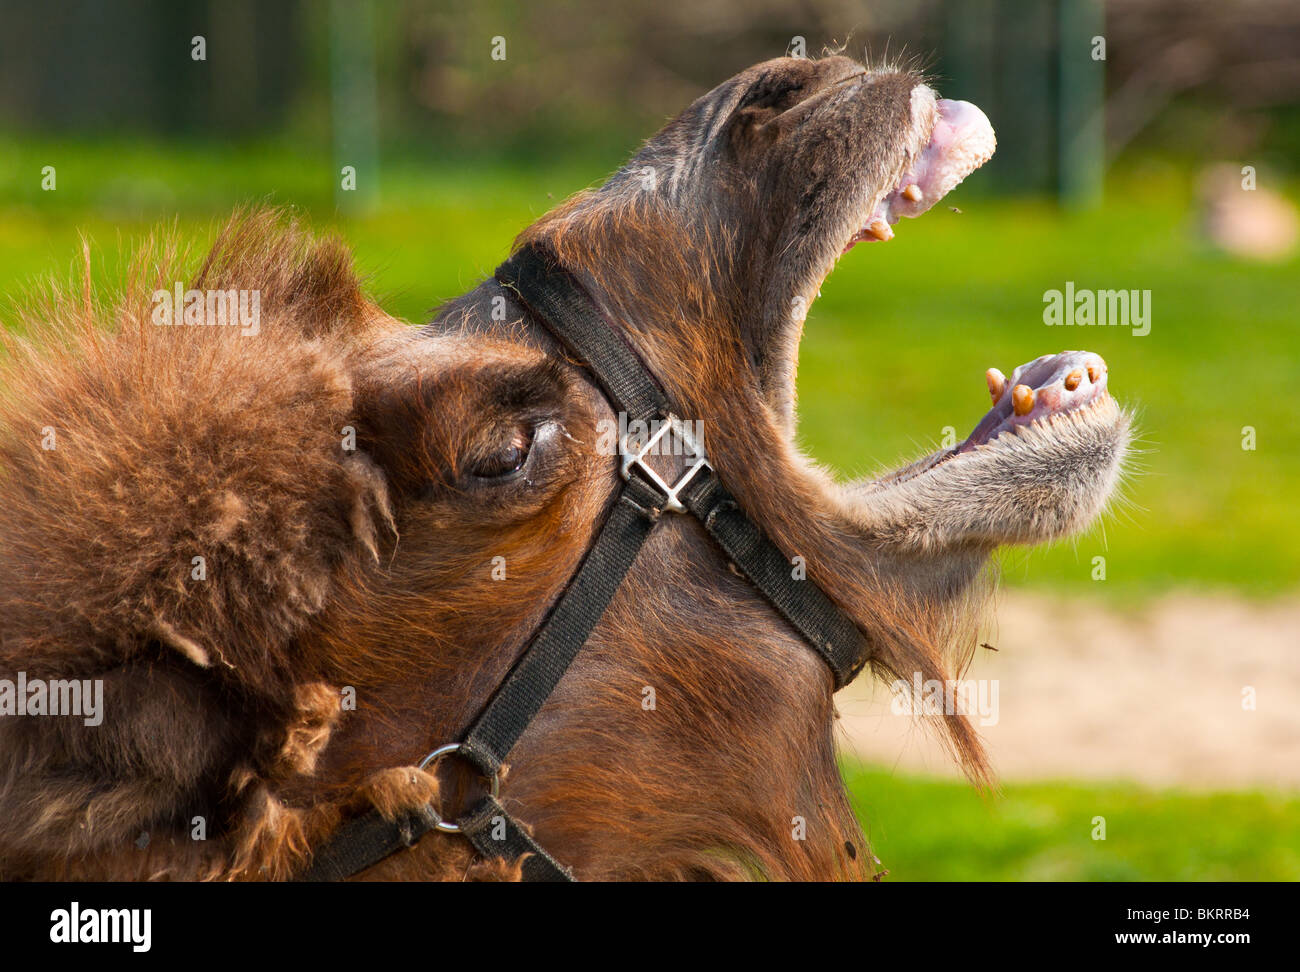 Bactrian Camel - Stock Image